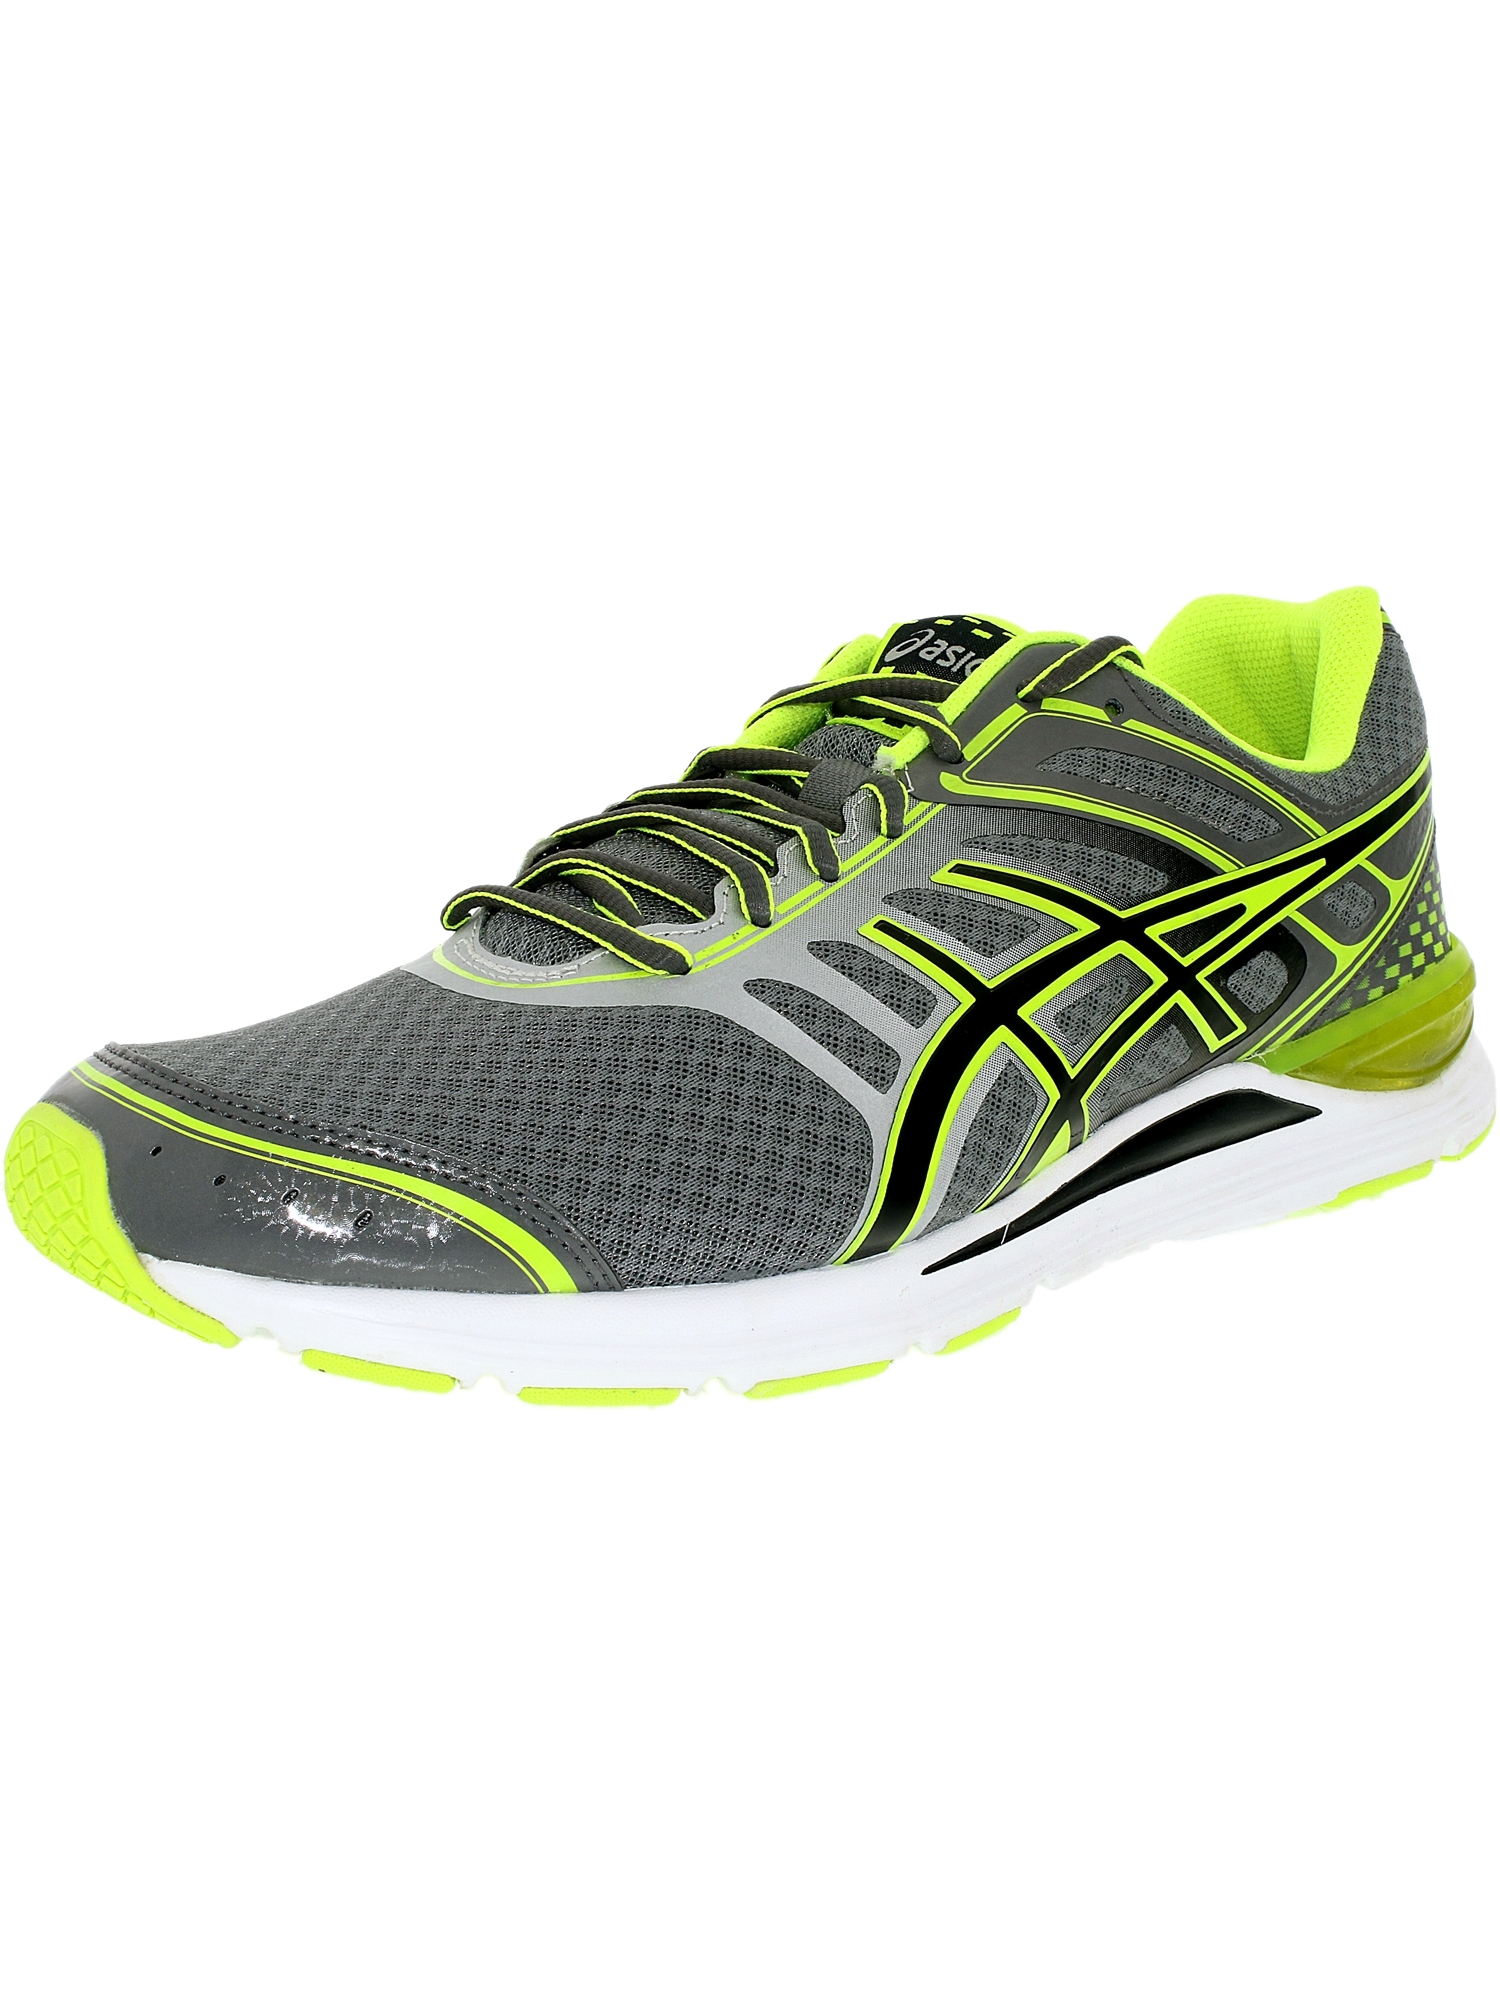 Asics Women's Gel-Storm Charcoal Black Flash Yellow Ankle-High Tennis Shoe - 12M